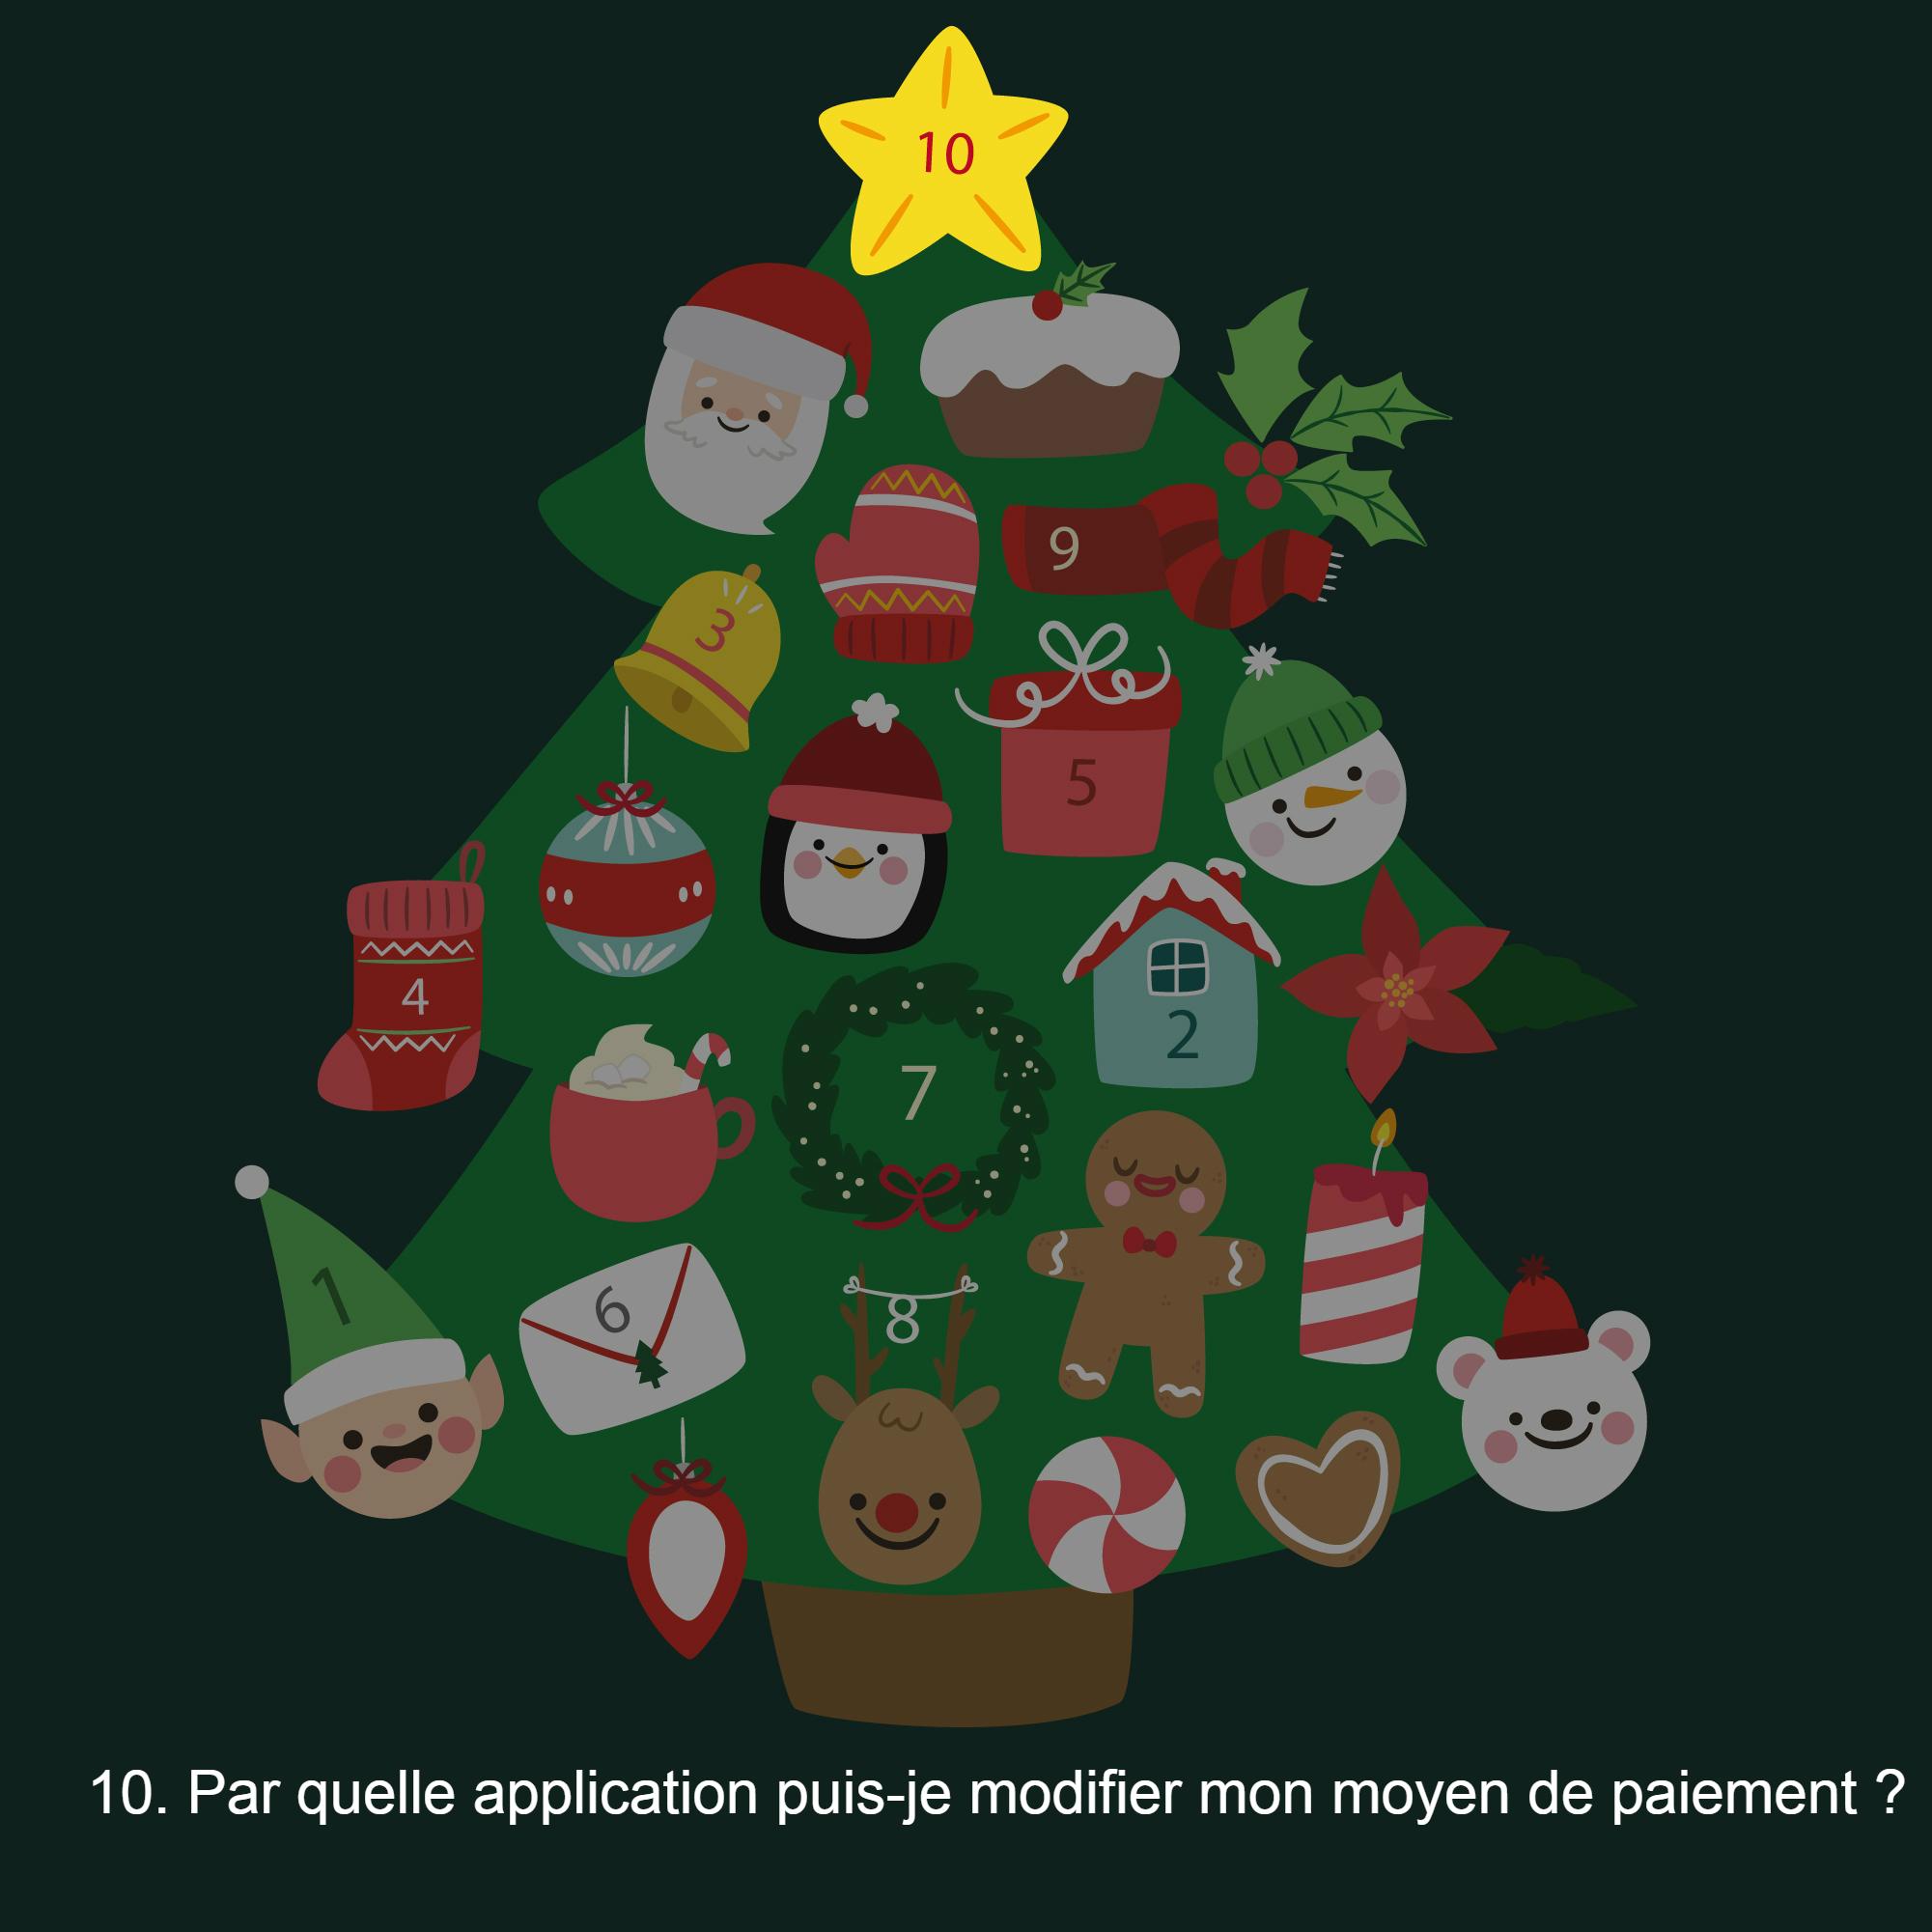 SFR_SFR-Le-noel-du-forum_31122018_TOPIC-jour-10_001#sfrclicid=F_topic_jeu-noel-2018-BOL.jpg